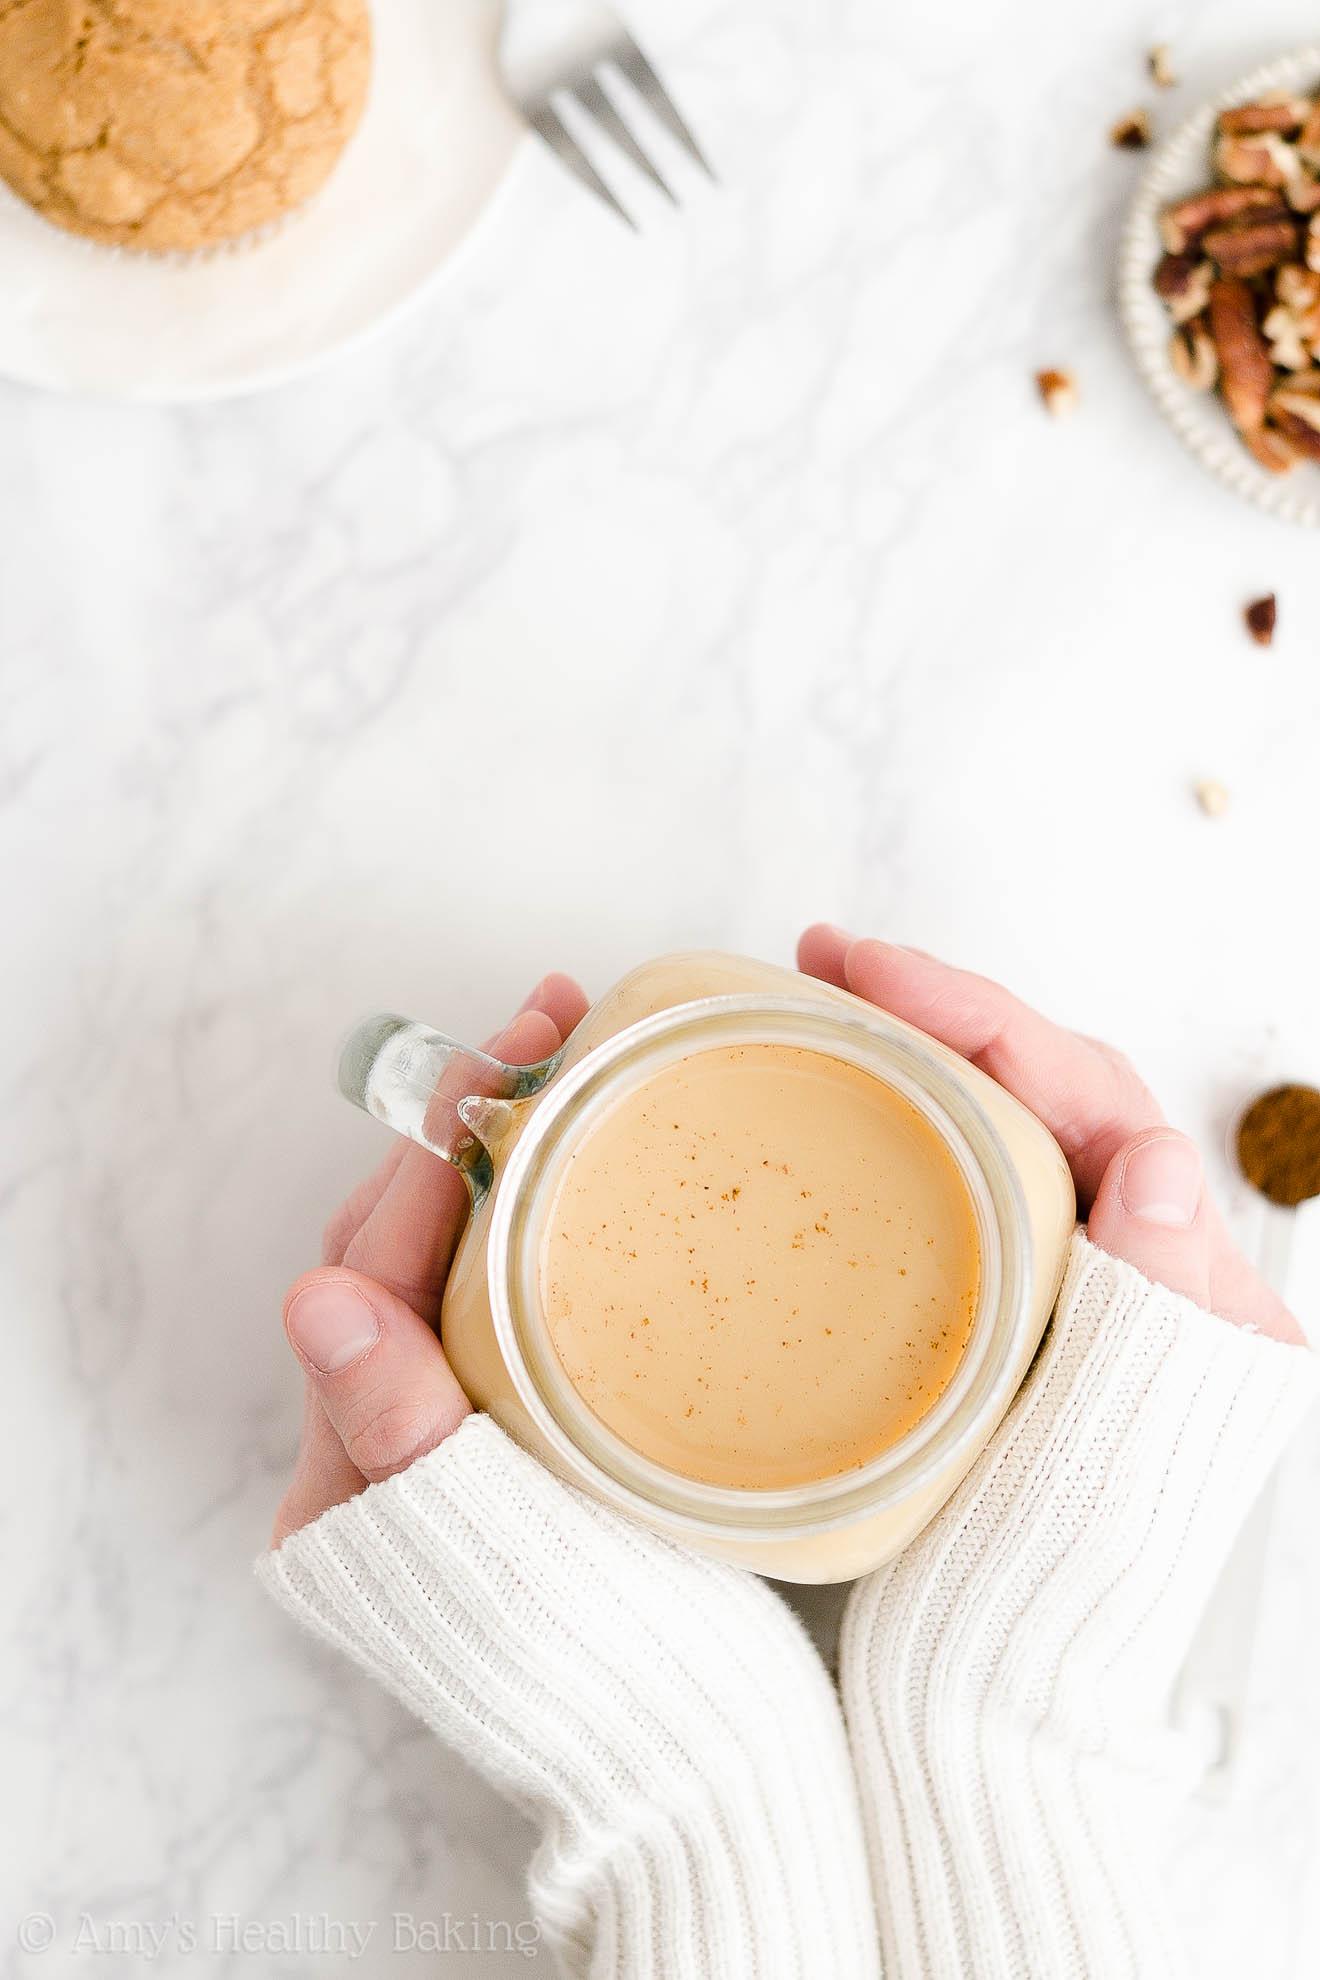 BEST EVER Easy Healthy Homemade Copycat Starbucks Vegan Eggnog Chai Latte